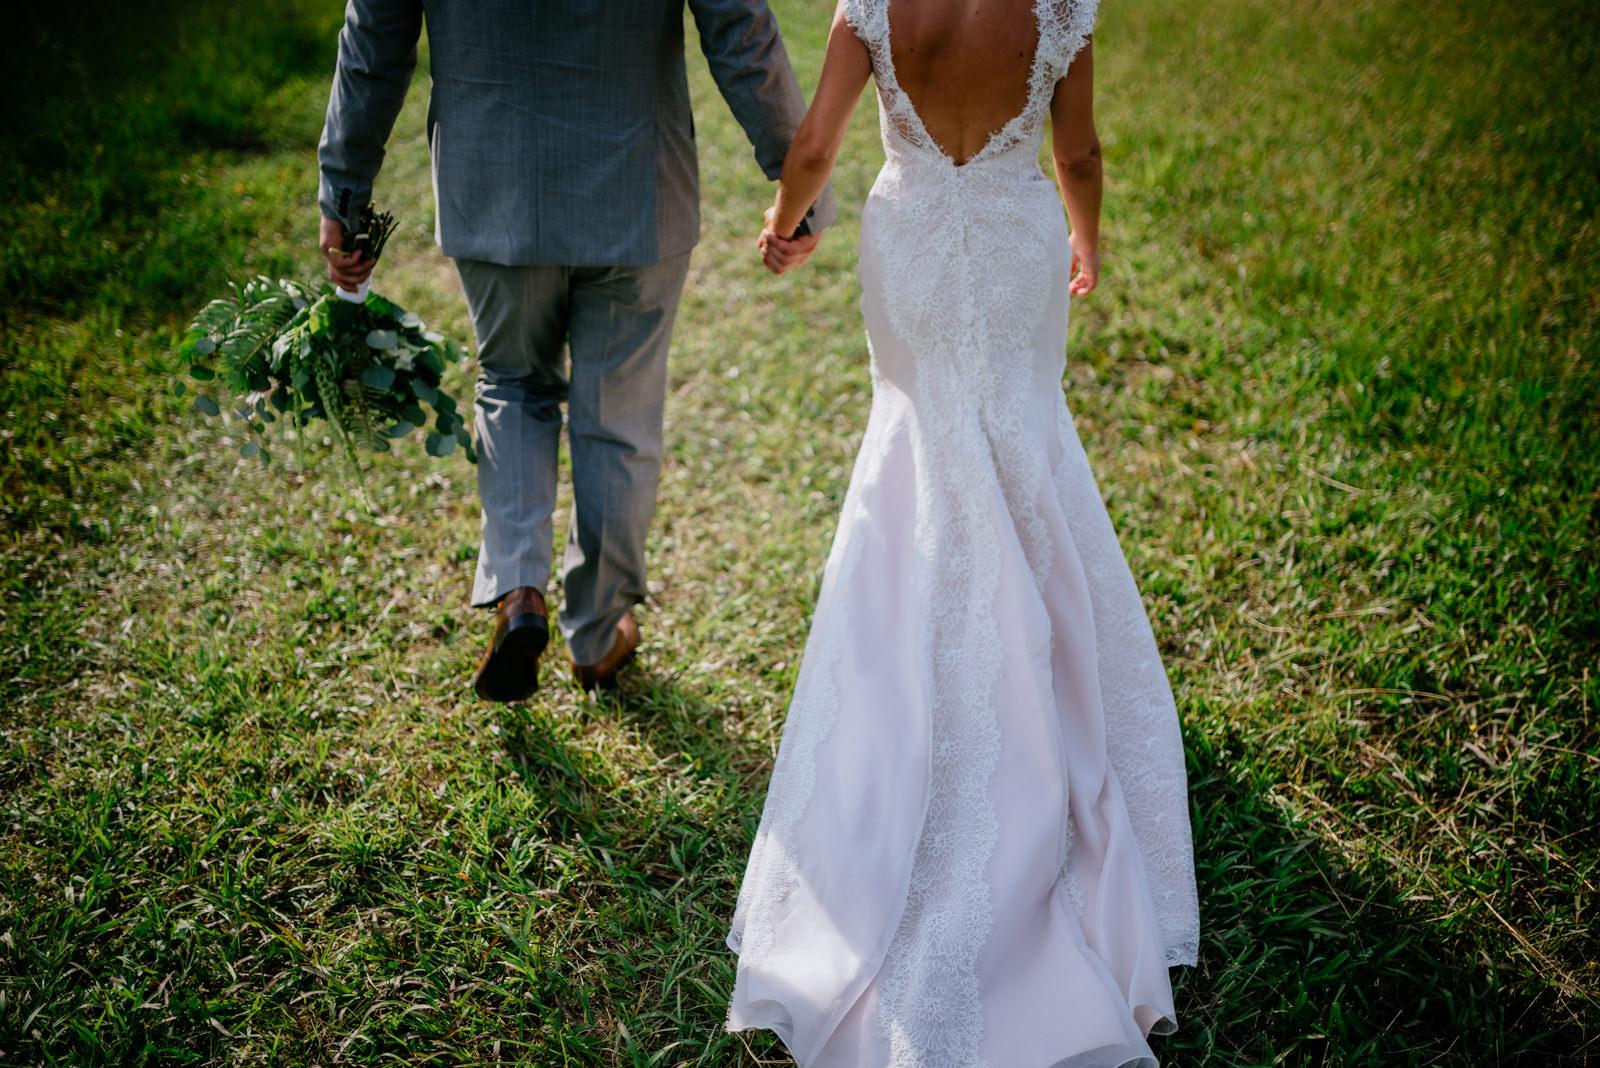 bride groom holding hands walking